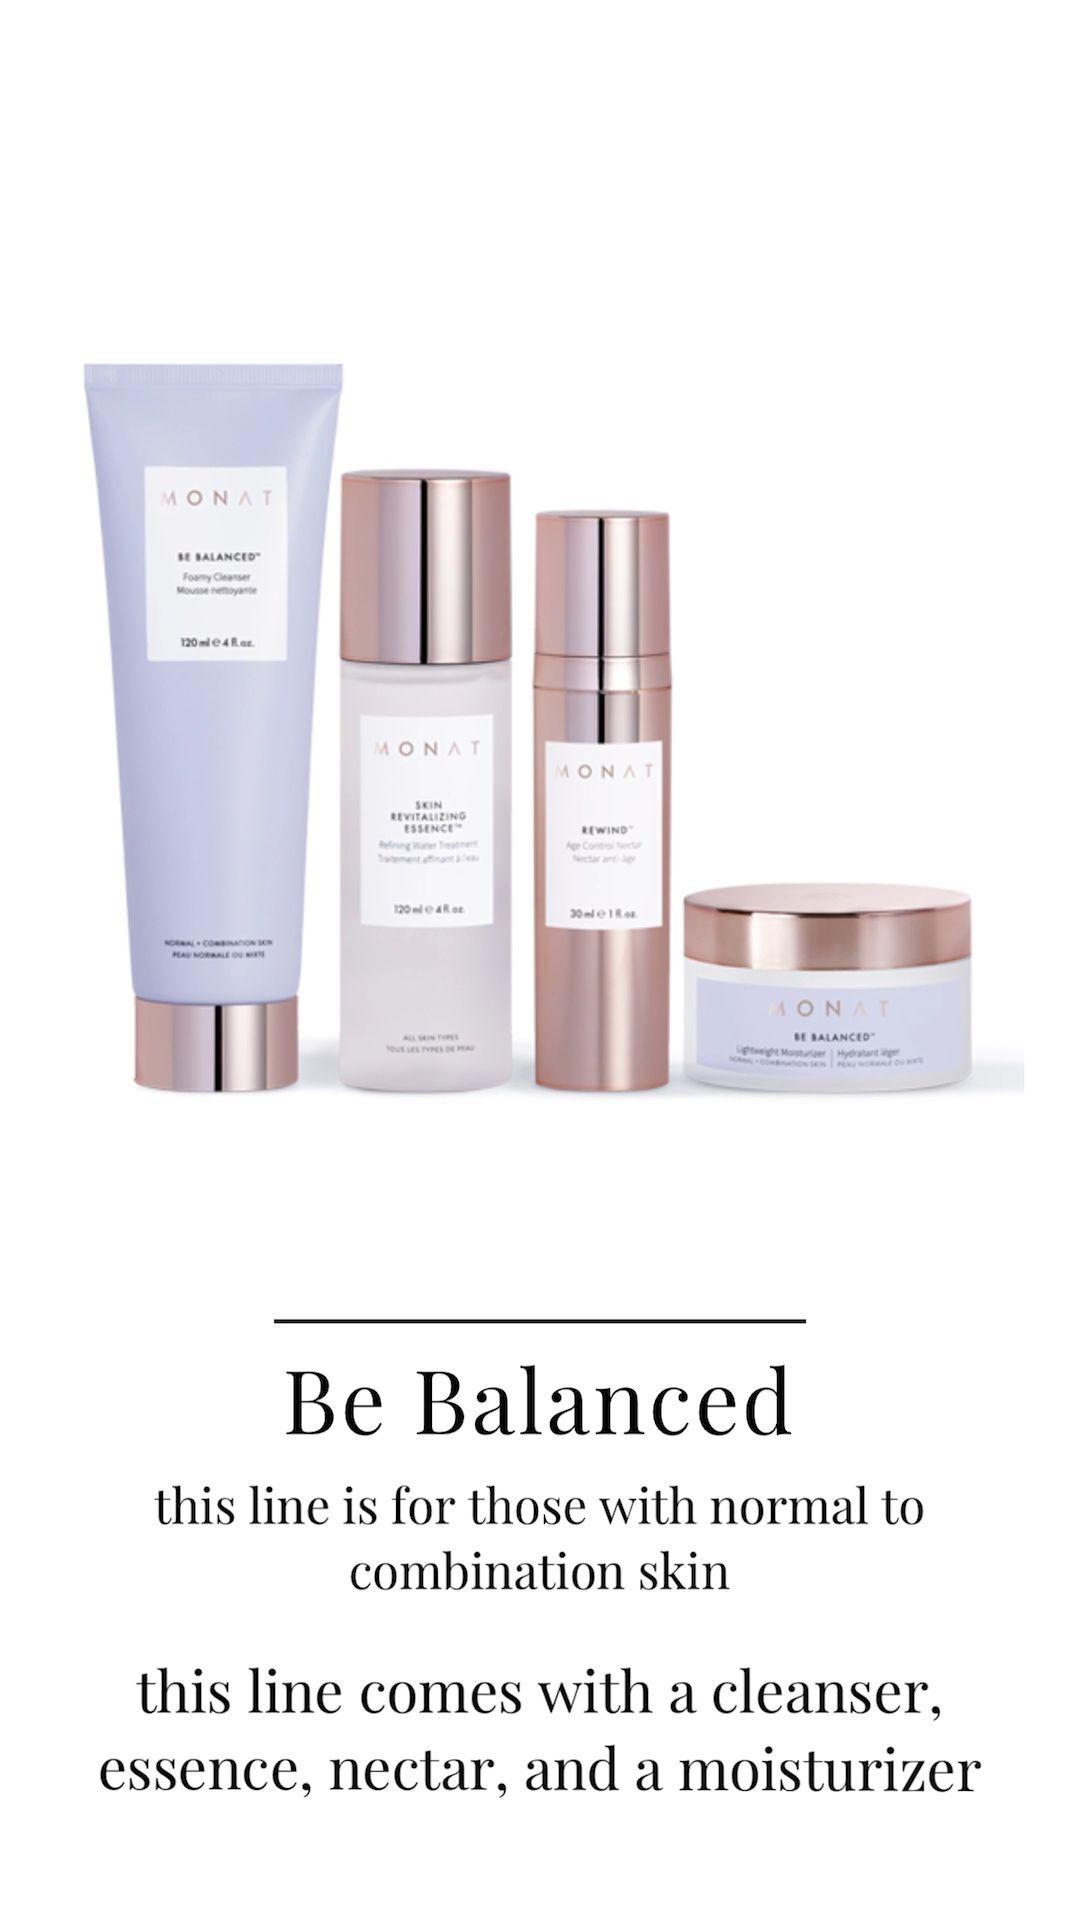 Be Balanced Monat Ig Myksmonat In 2020 Acne Scar Removal Monat Oily Skin Care